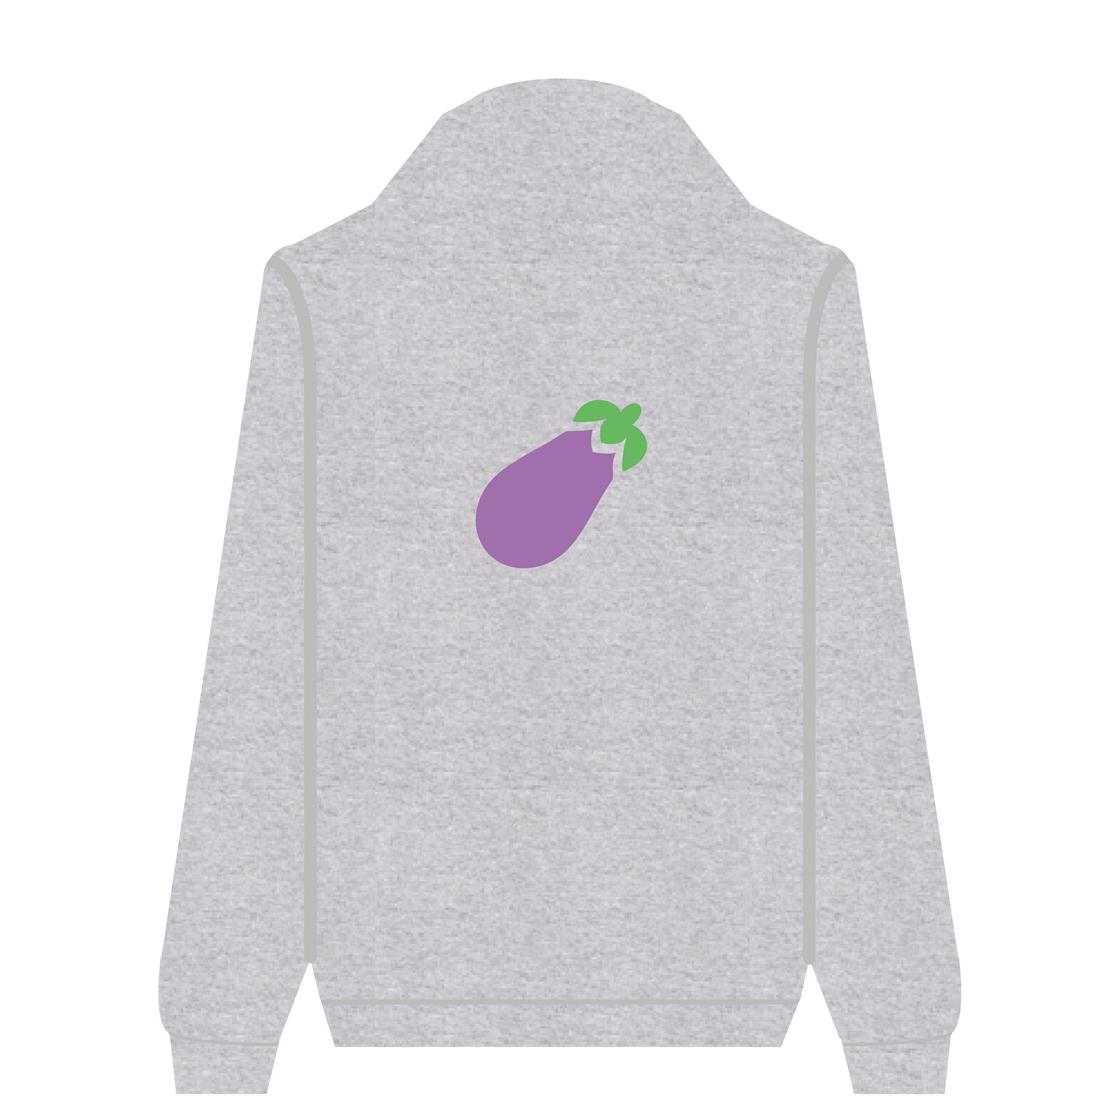 Full Zip Hoodie Eggplant   Wuzzee